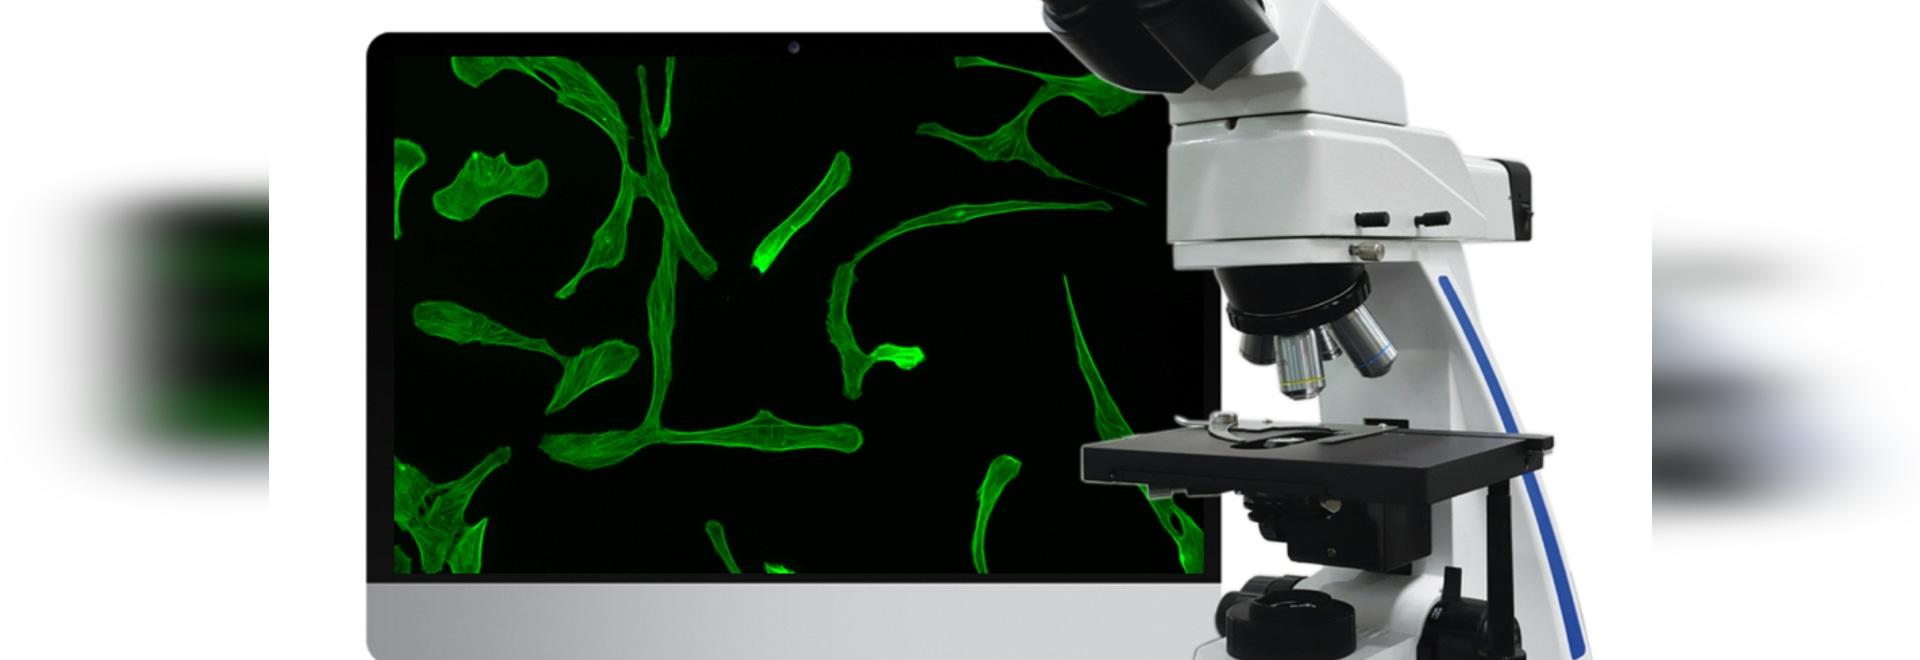 MF31 Fluorescence microscope